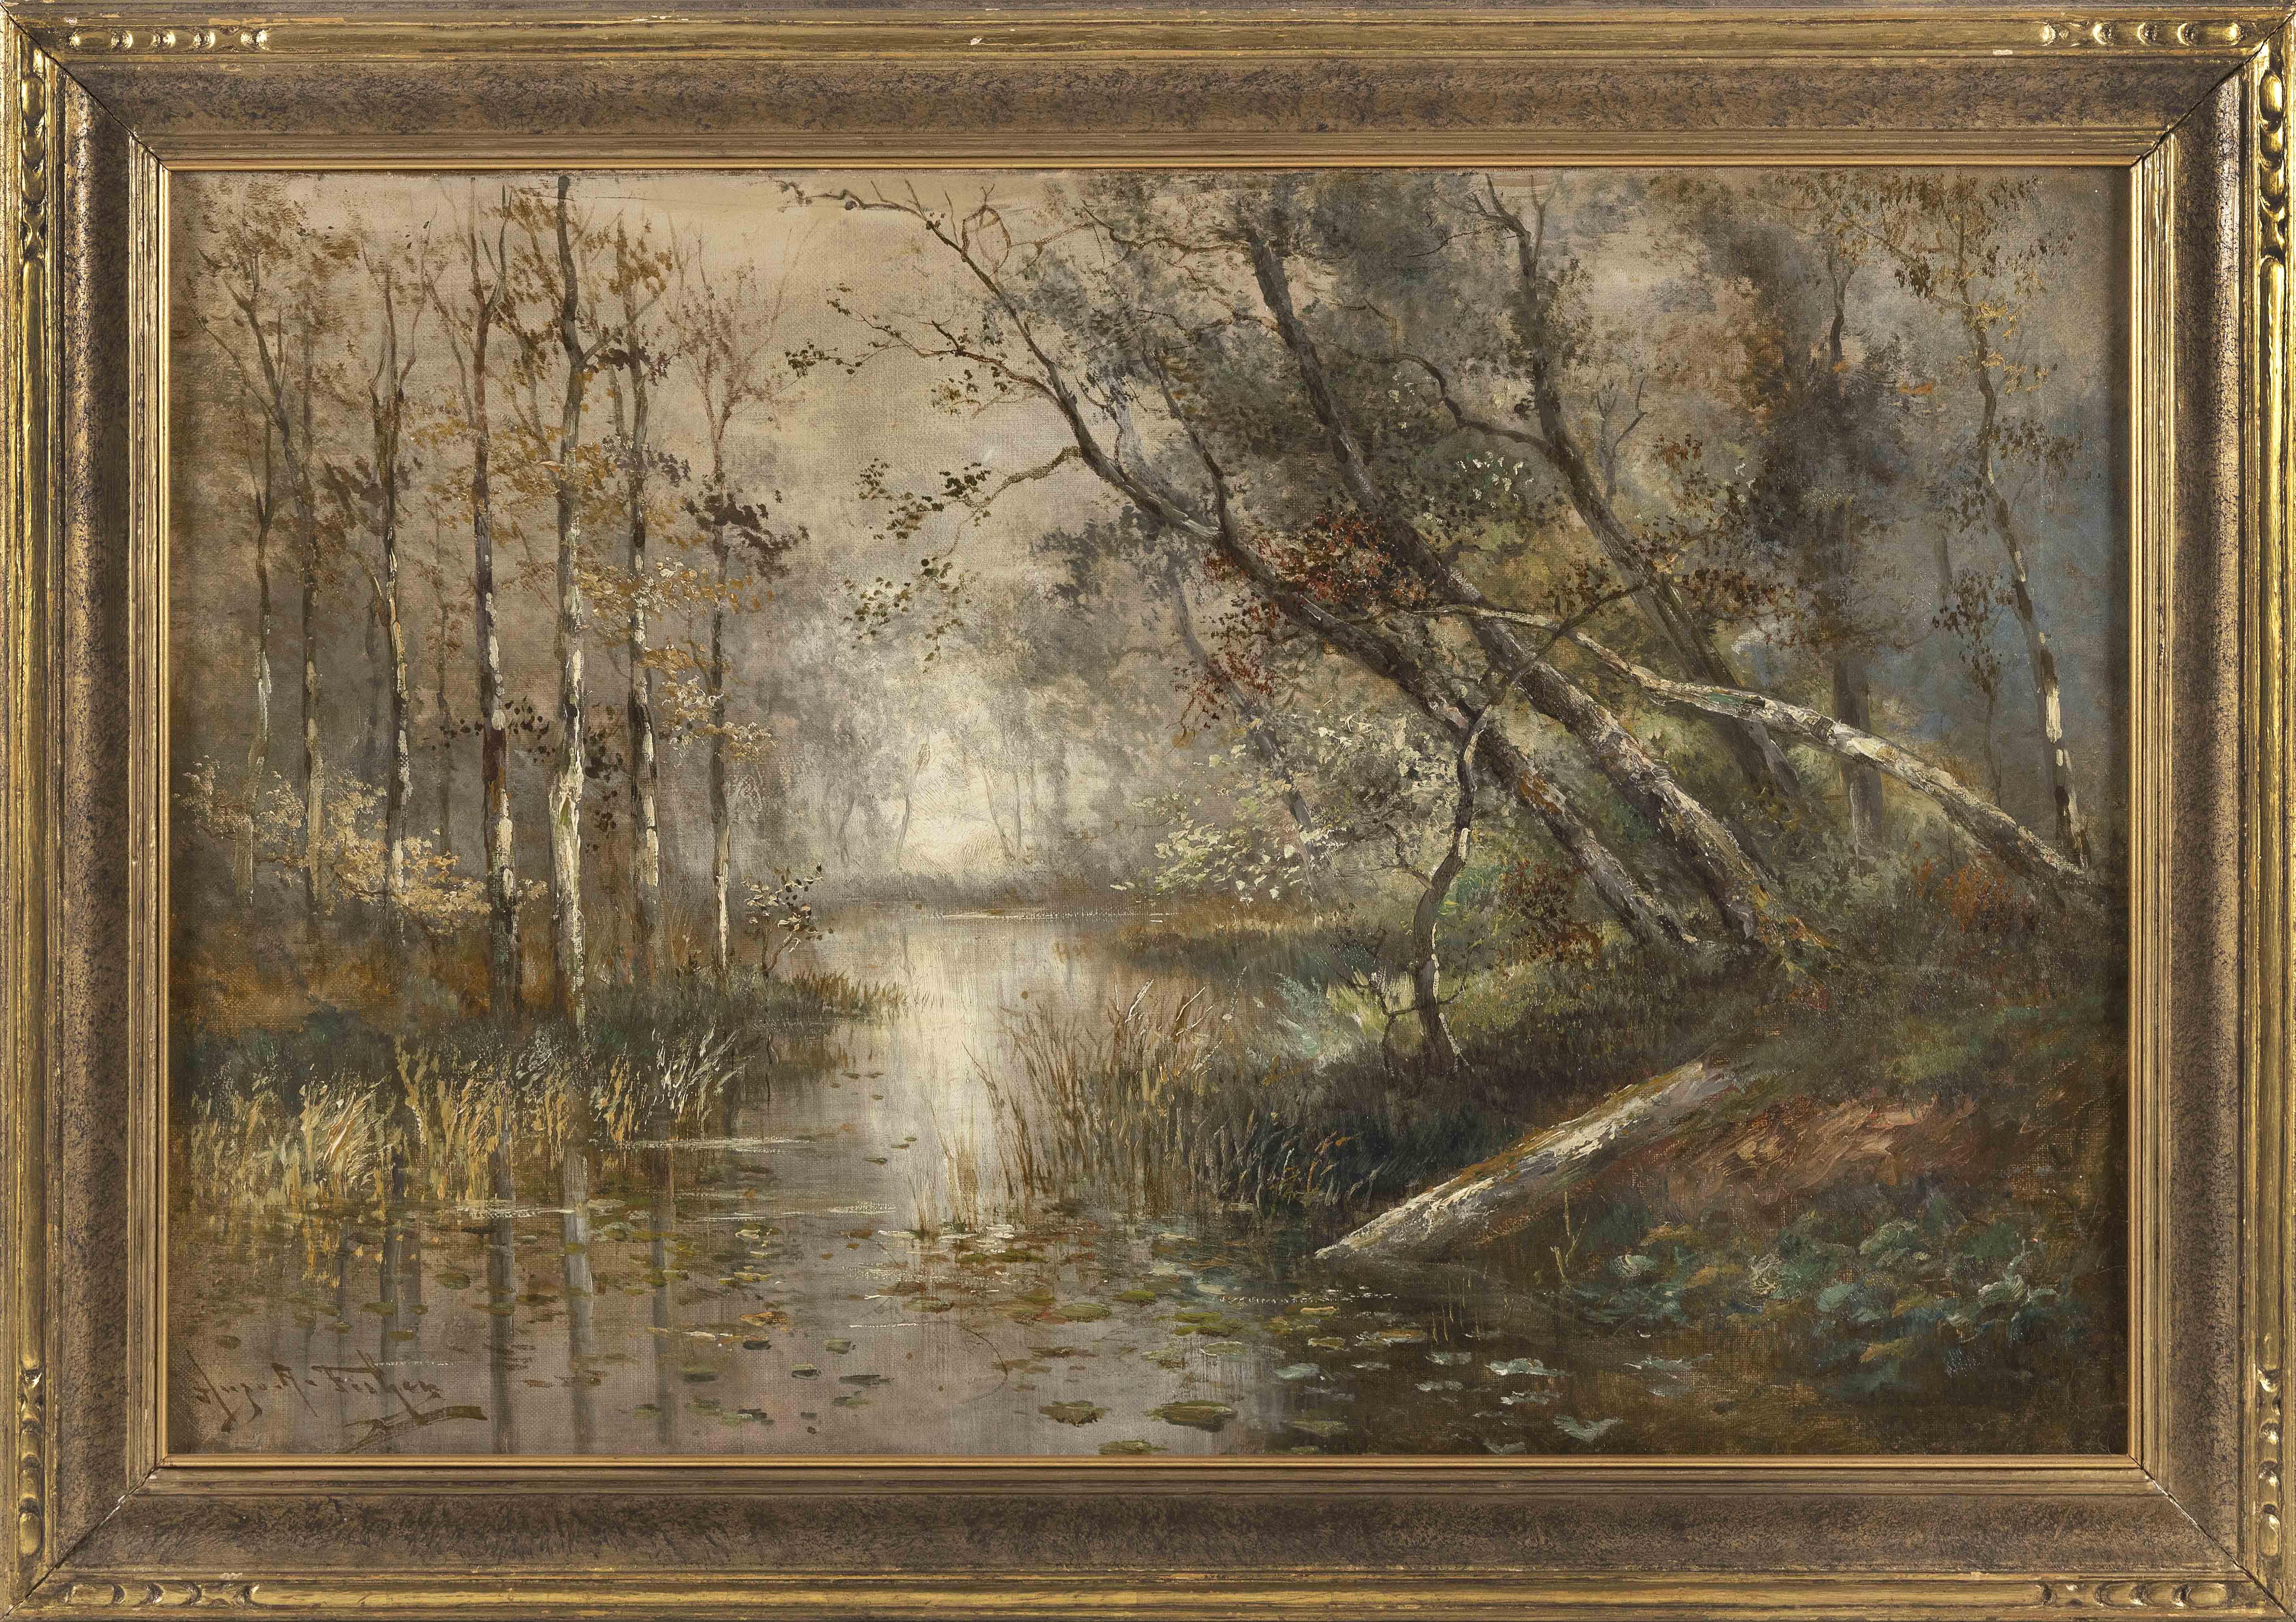 "HUGO ANTON FISHER (California/New York, 1854-1916), A forest river., Oil on canvas, 20"" x 30"". Framed 25"" x 35""."